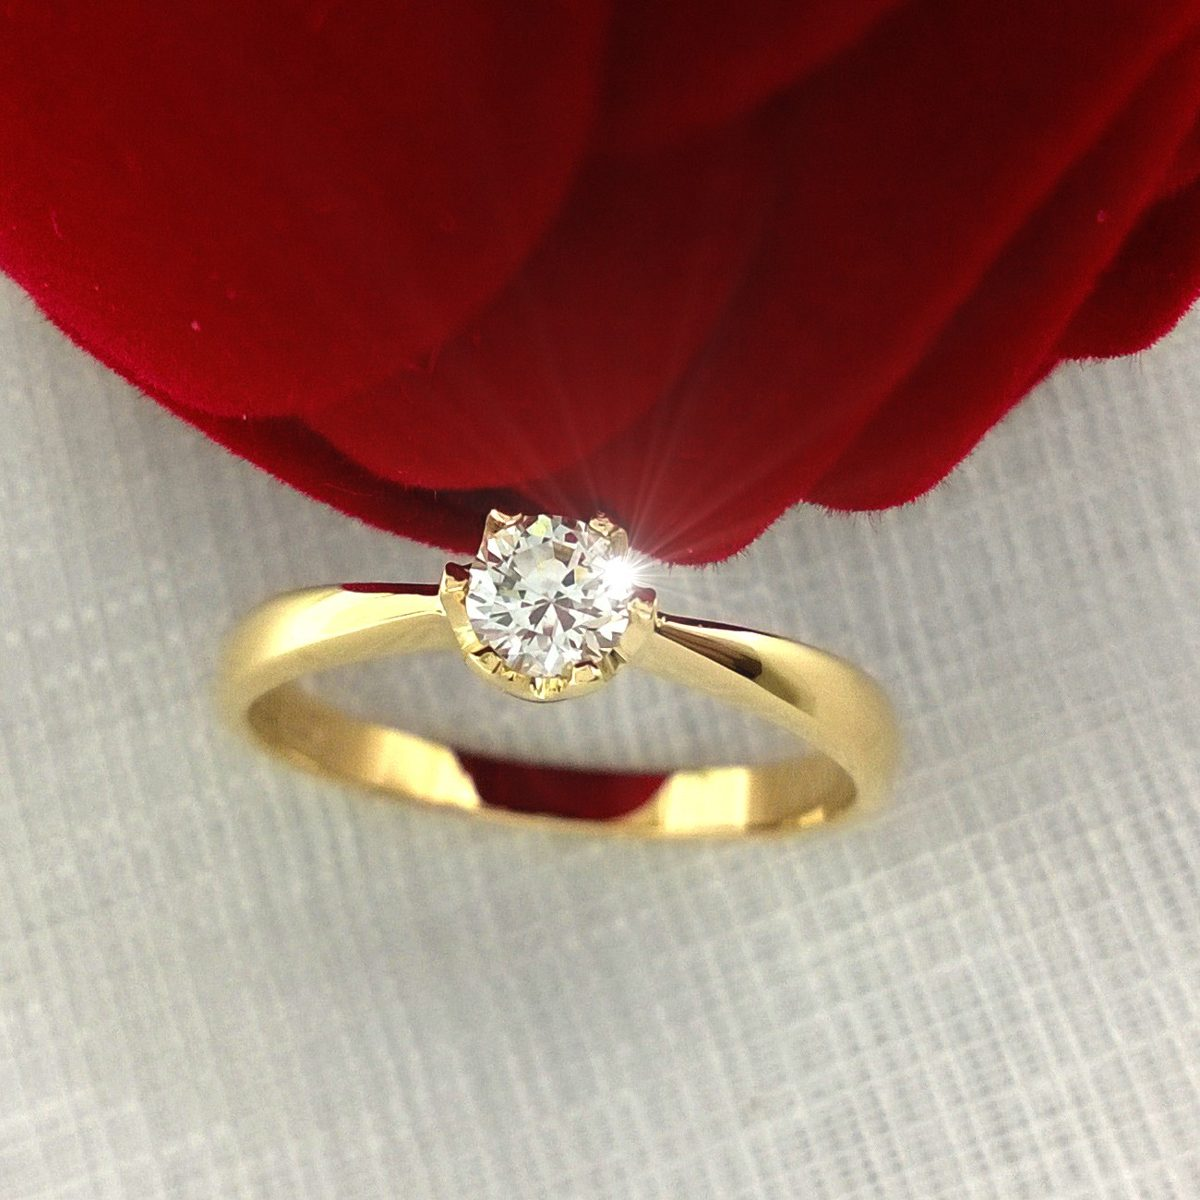 15ff3565ba556 anel diamante 0.23 ct ouro 18k maciço solitario gema natural. Carregando  zoom.